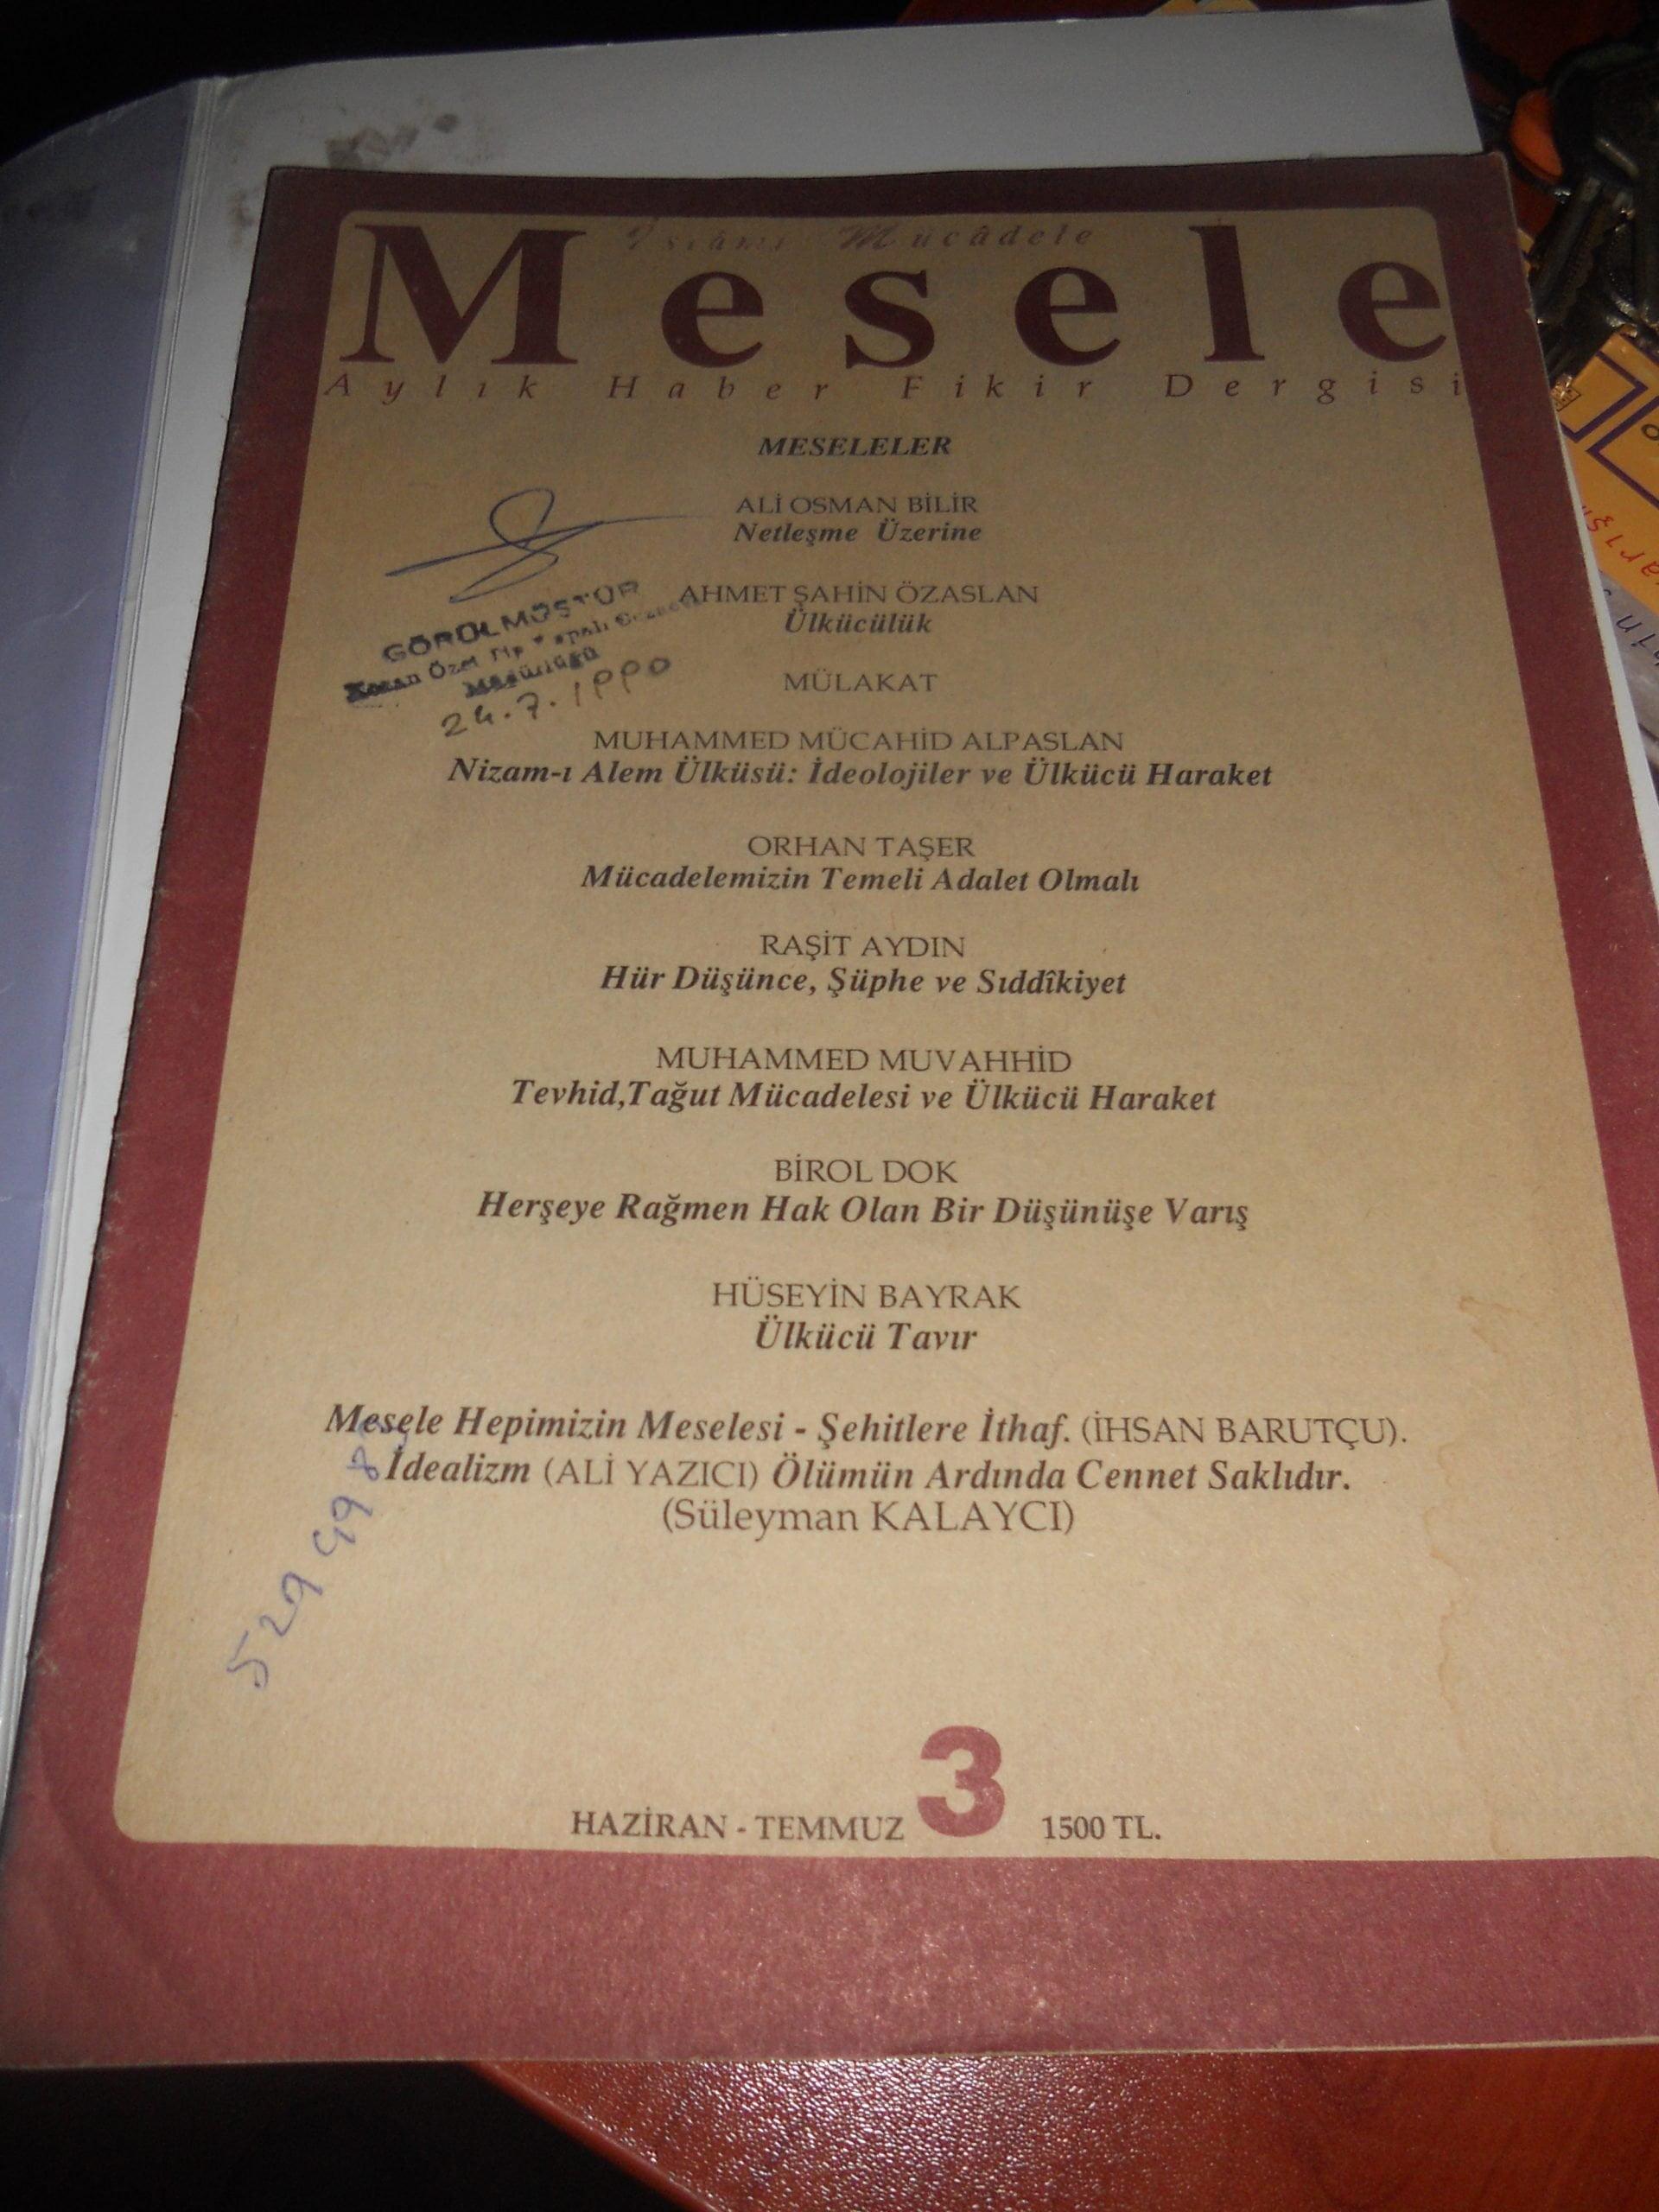 Mesele dergisi/1990/ 3 adet/ toplam.15 tl